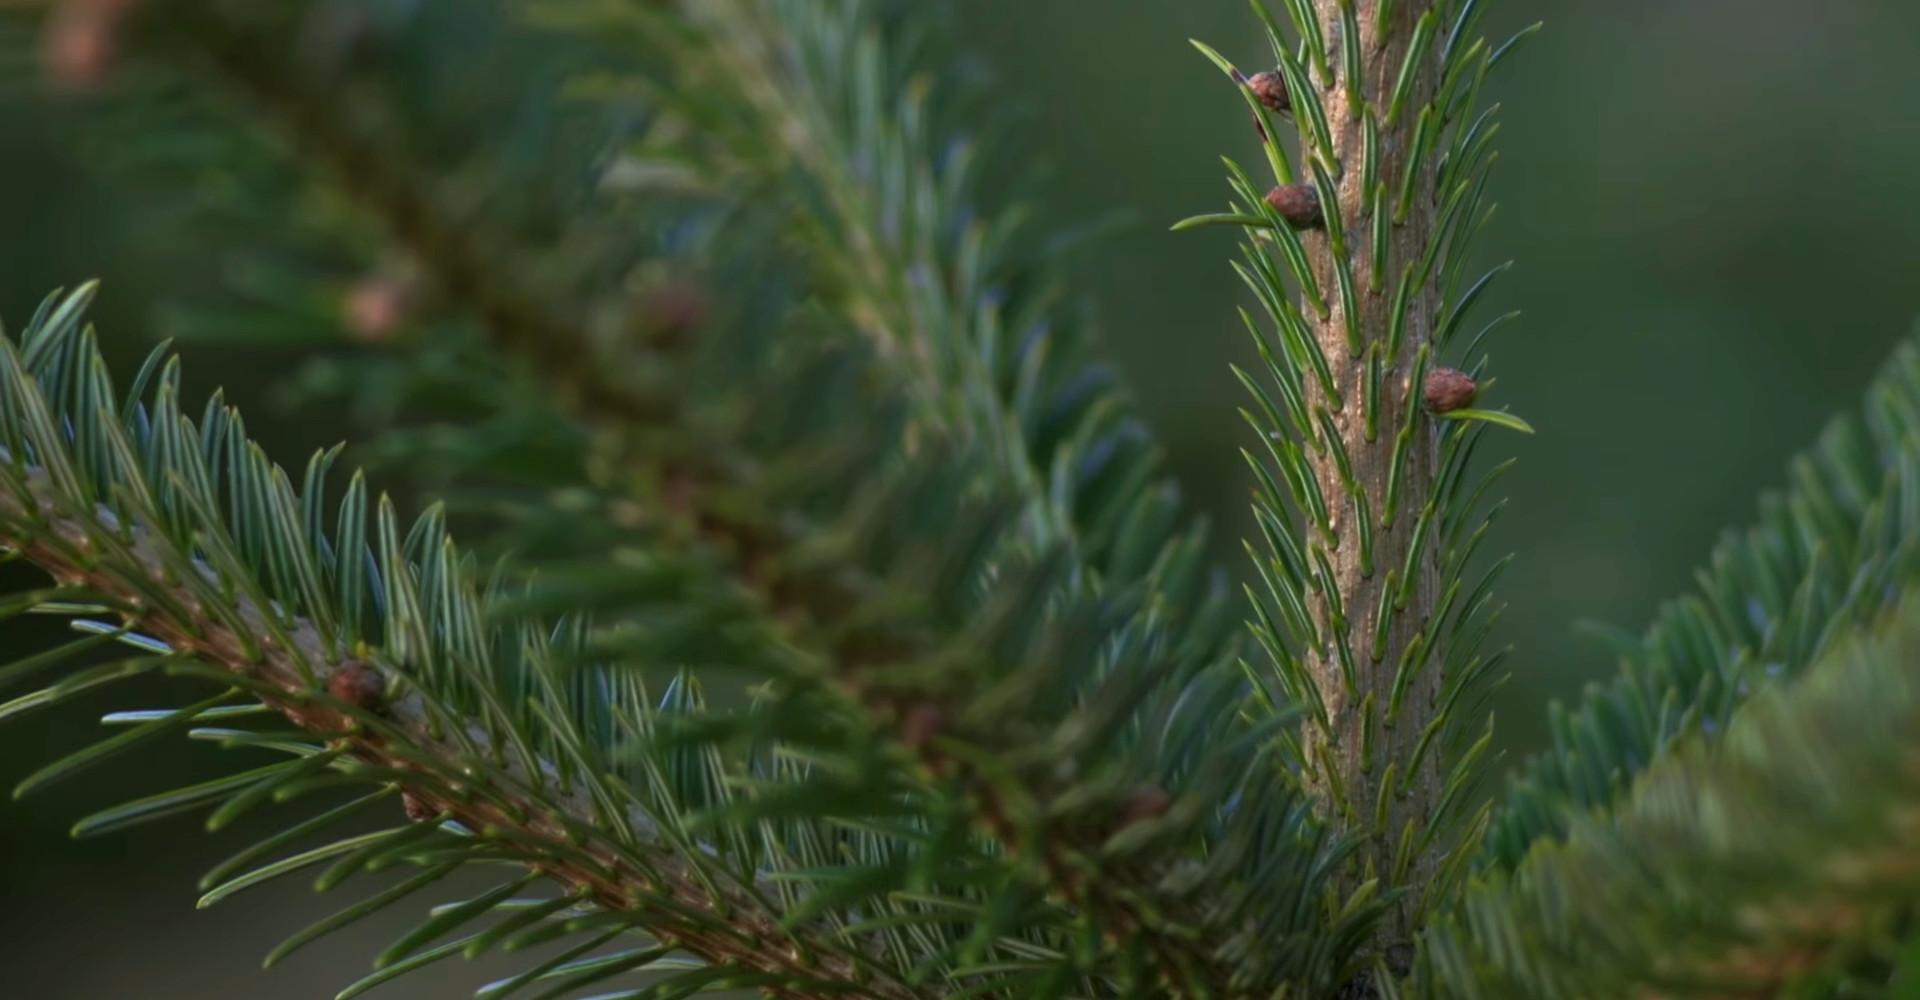 De mooiste Nordmann Excellent kerstbomen in Hillegom vanaf € 15,-